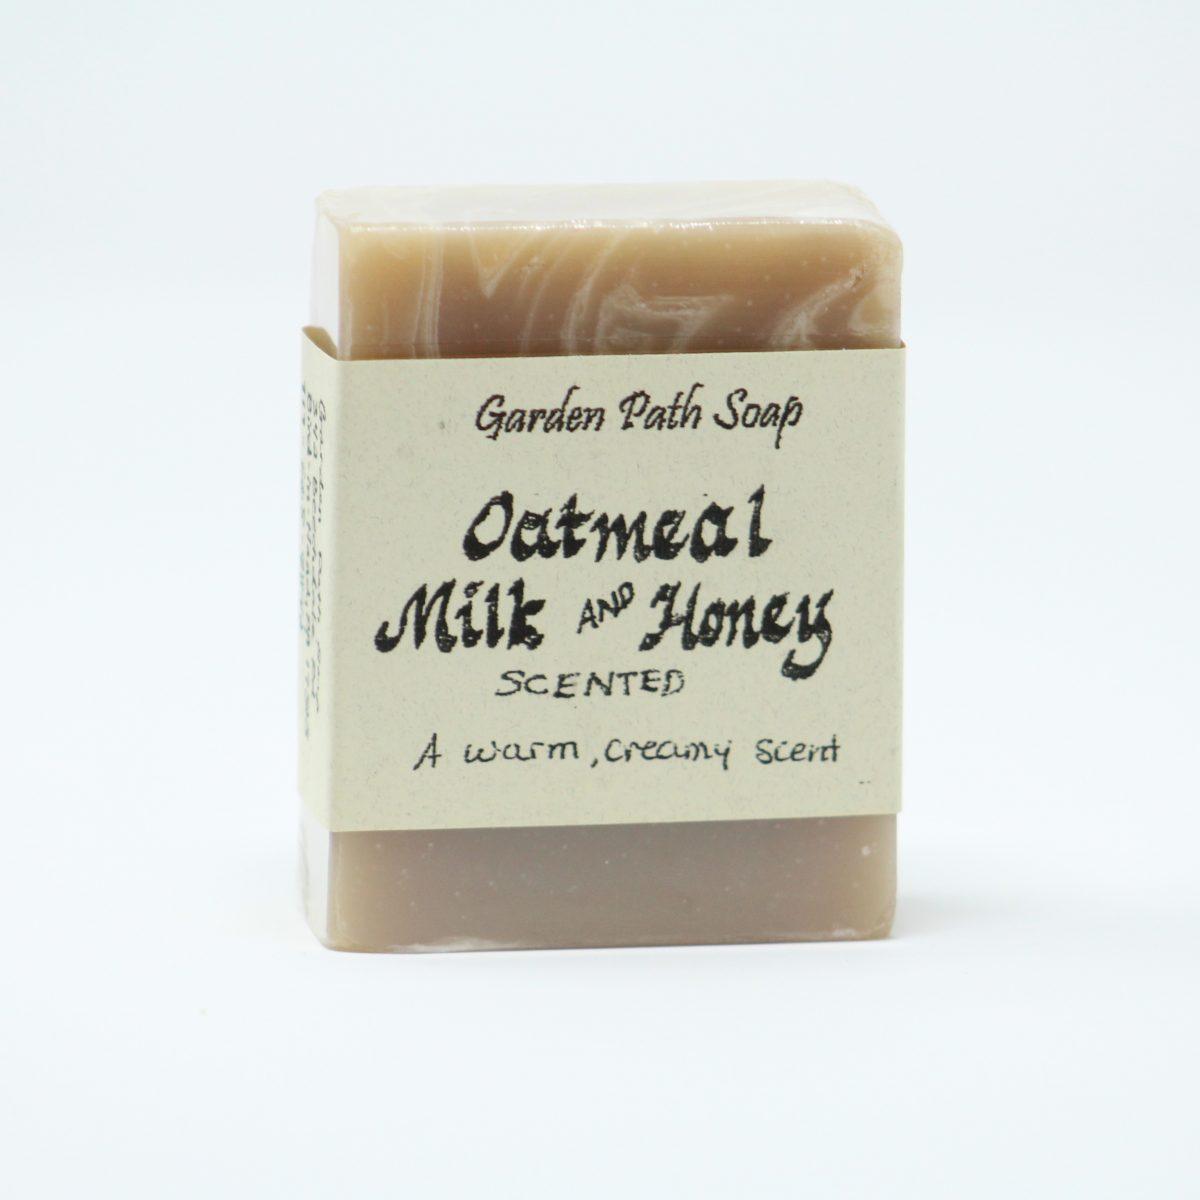 Oatmeal Milk and Honey-Homemade Lye Soaps-Family Farm Handcrafts